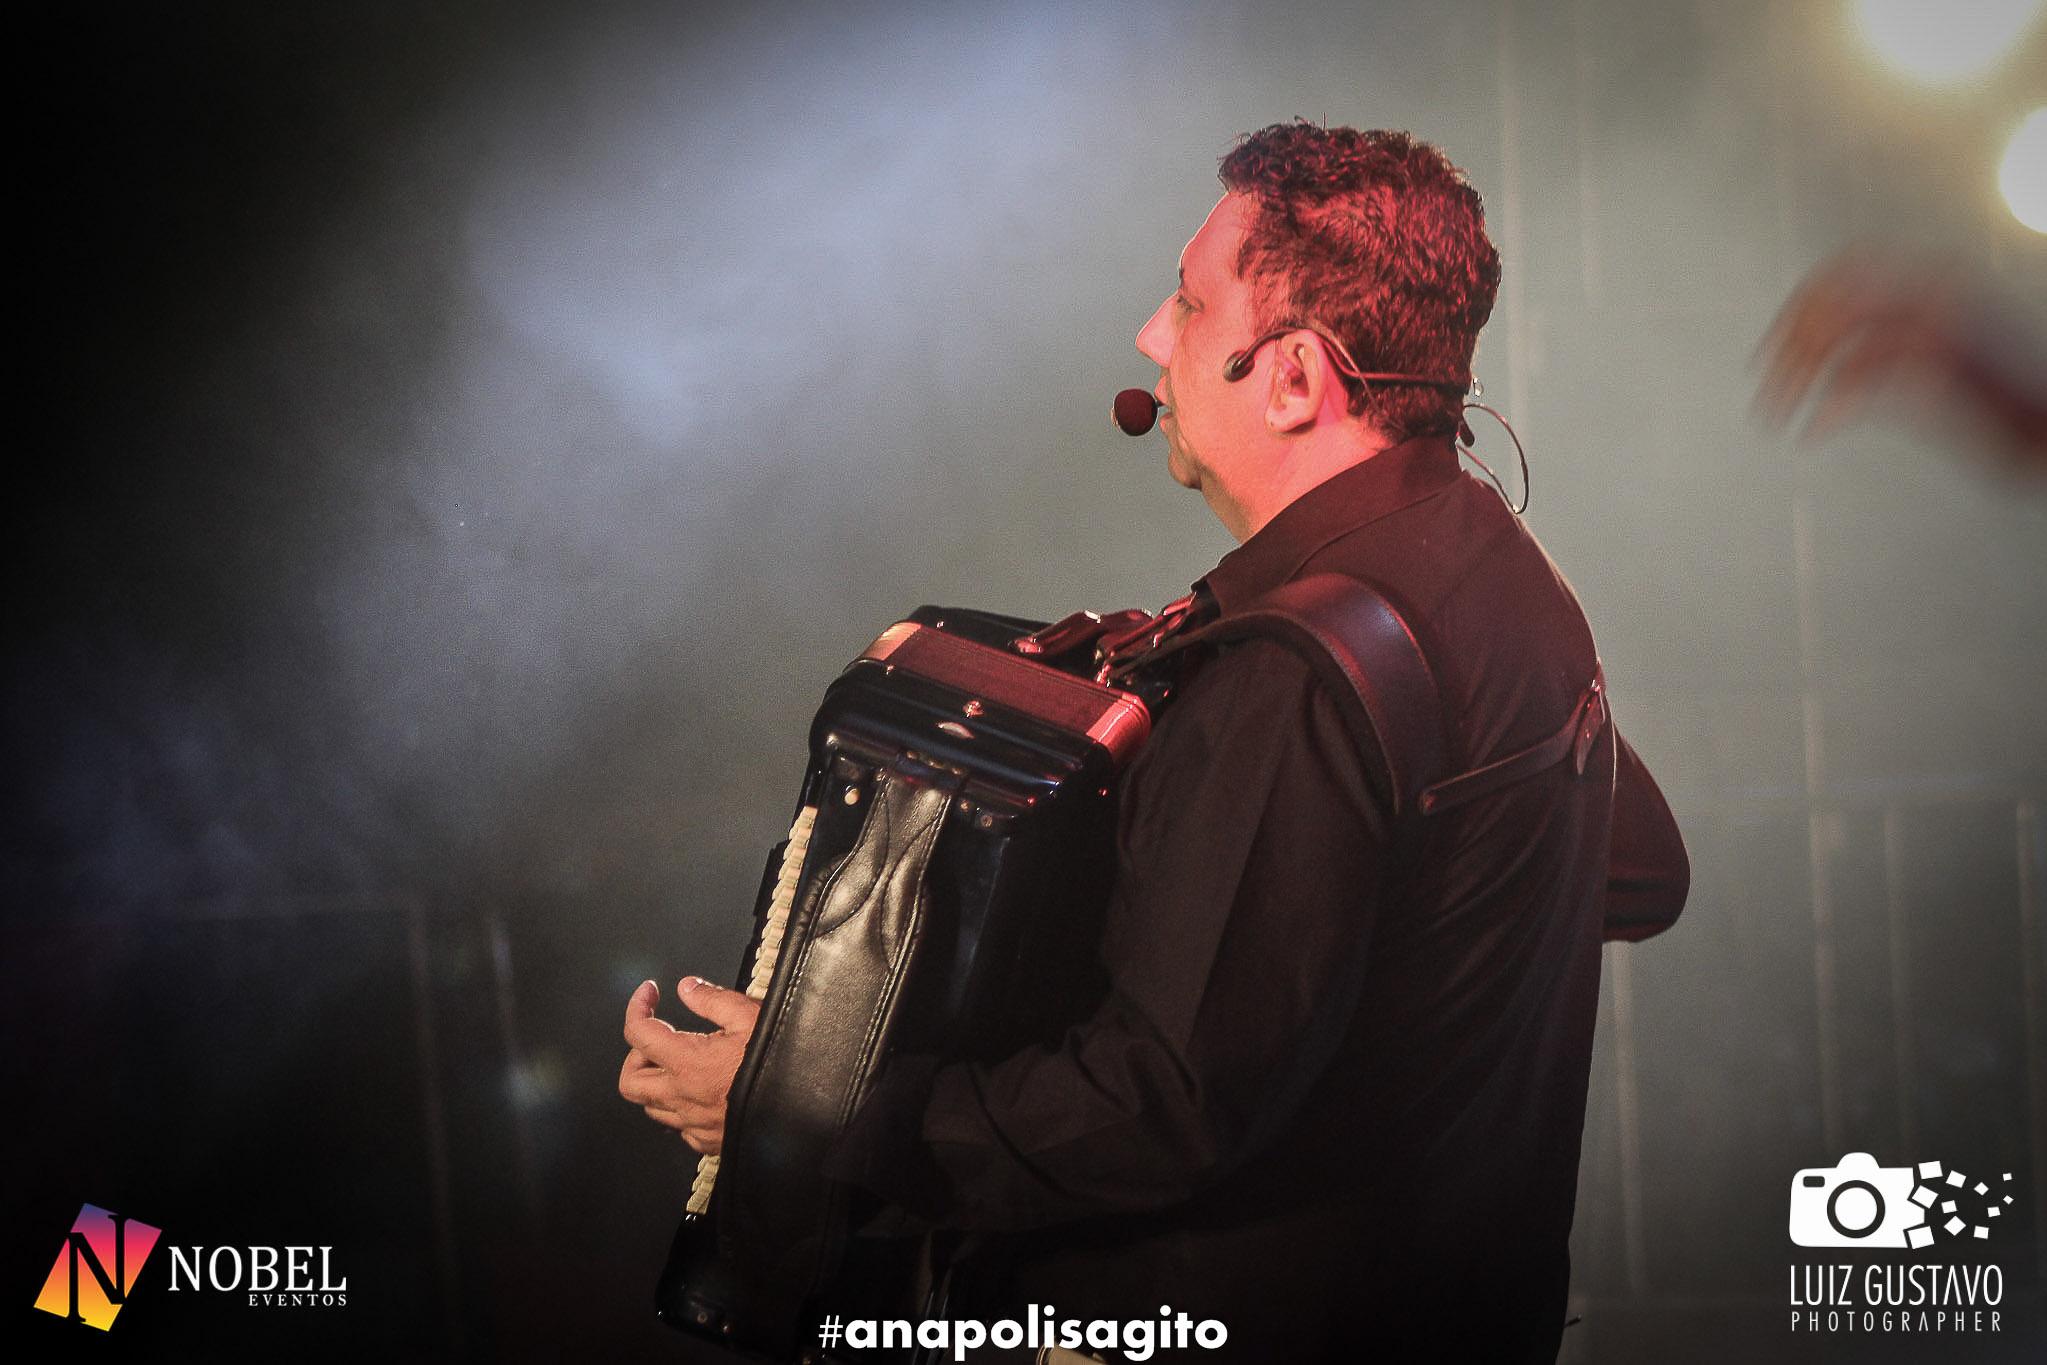 Luiz Gustavo Photographer-123